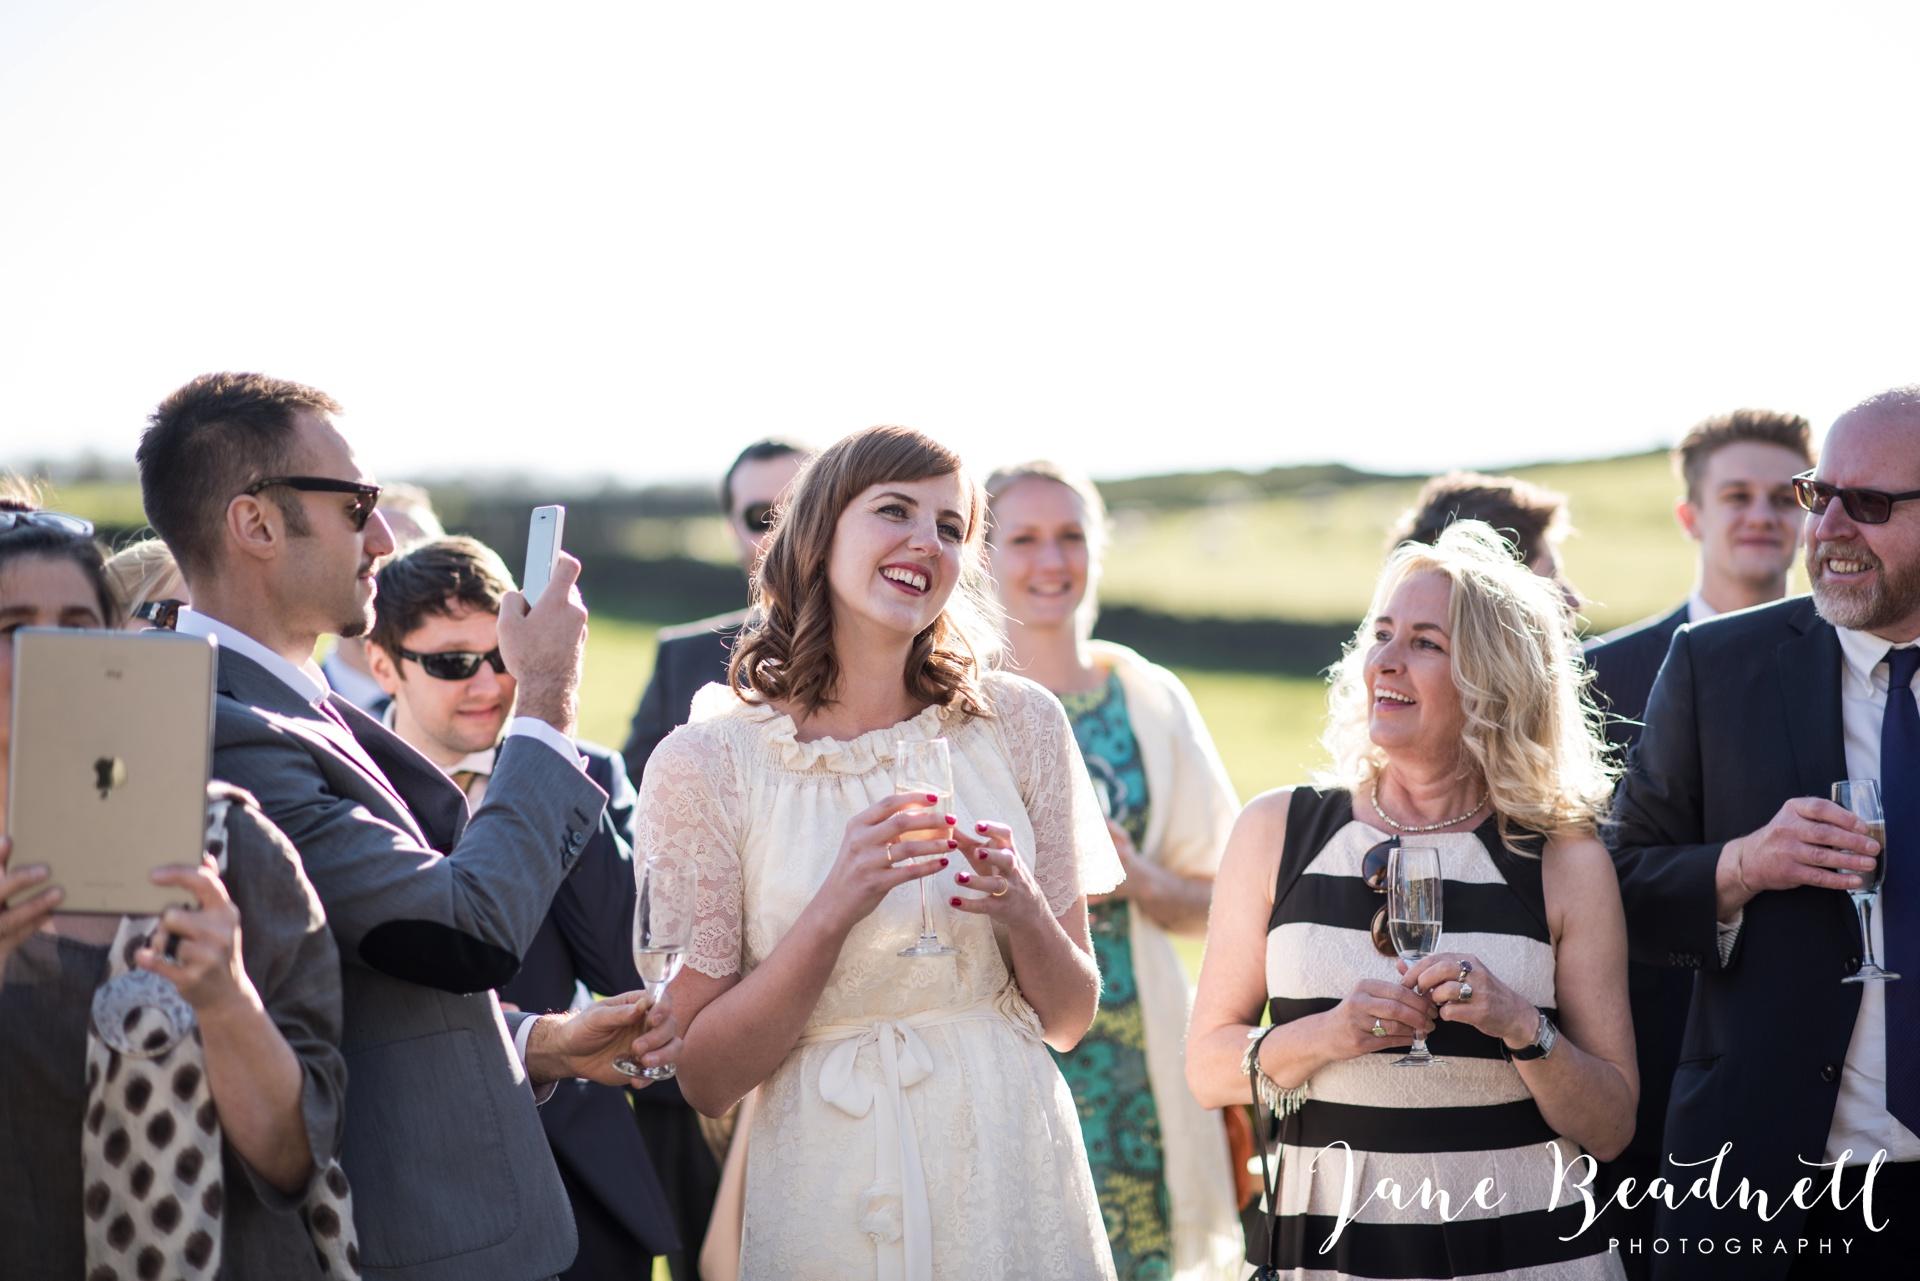 Jane Beadnell fine art wedding photographer The Cheerful Chilli Barn Otley_0042